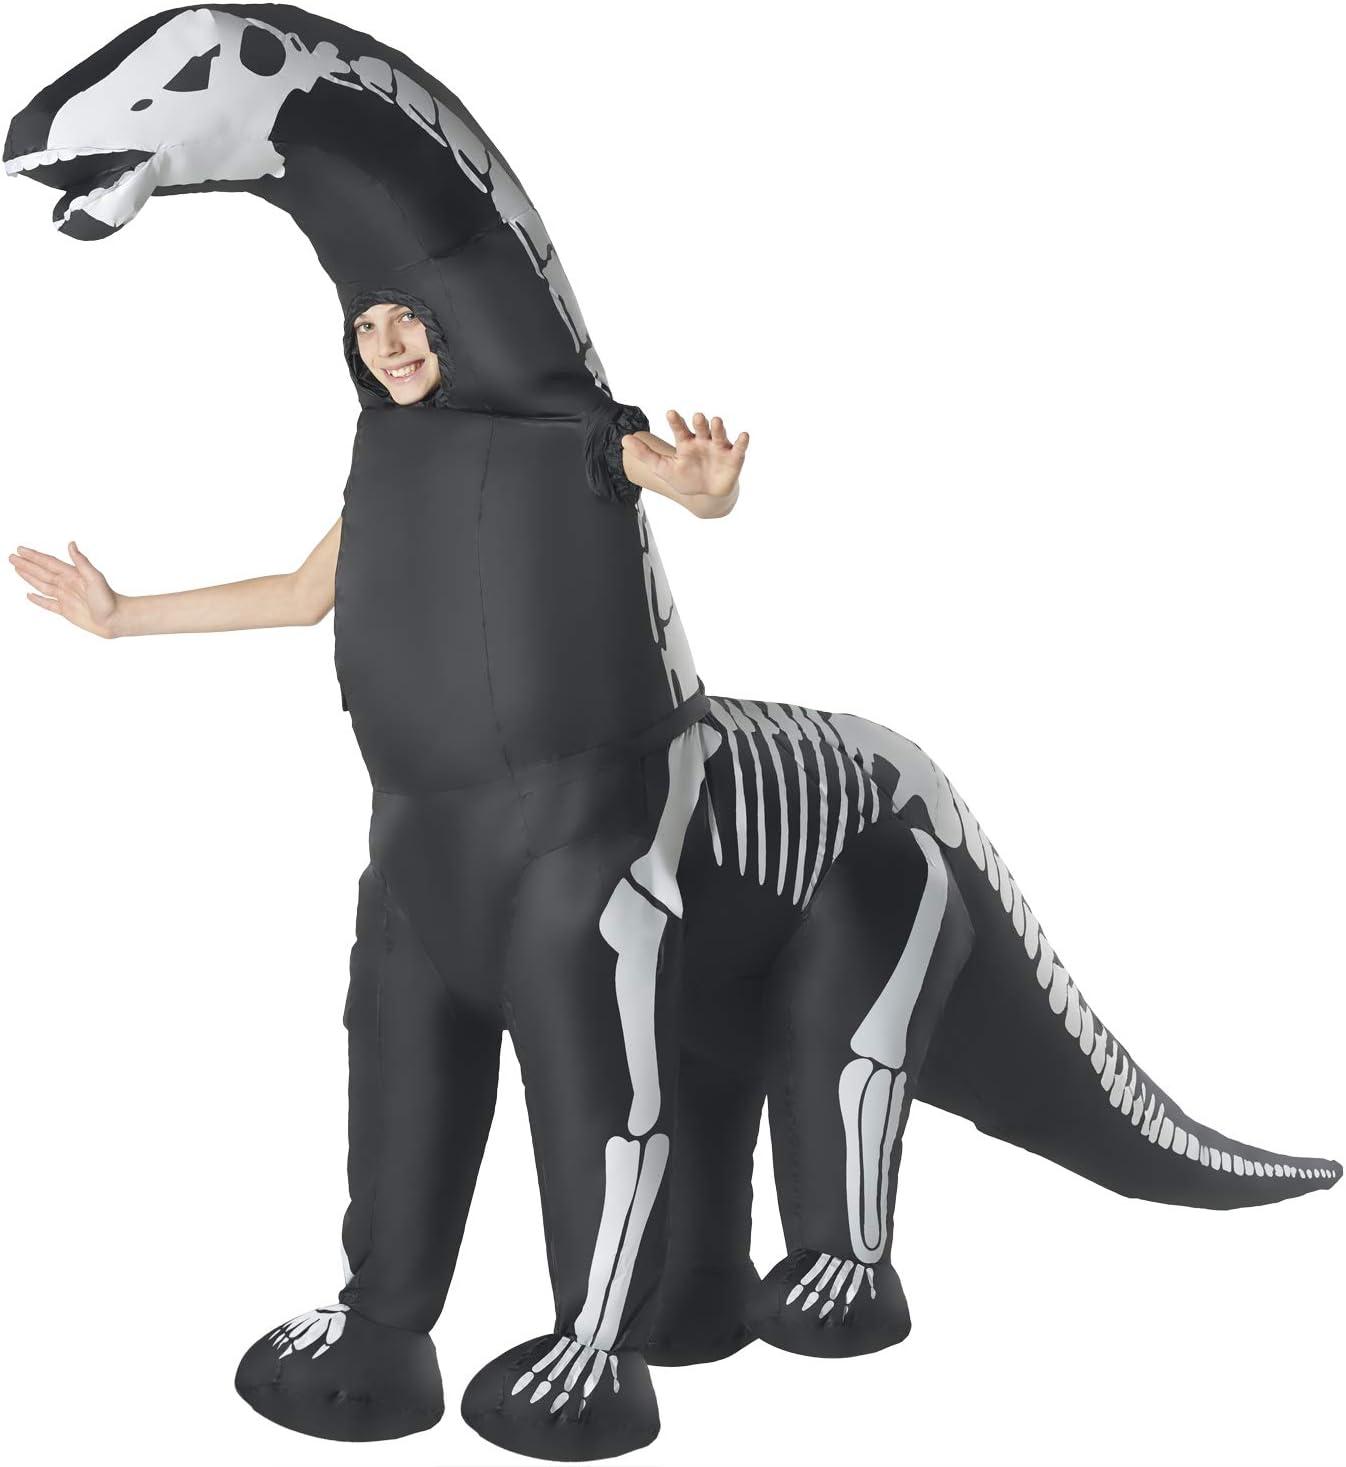 Opblaasbaar kostuum Unisex, Diplofiteks skelet, eenheidsmaat kinderen